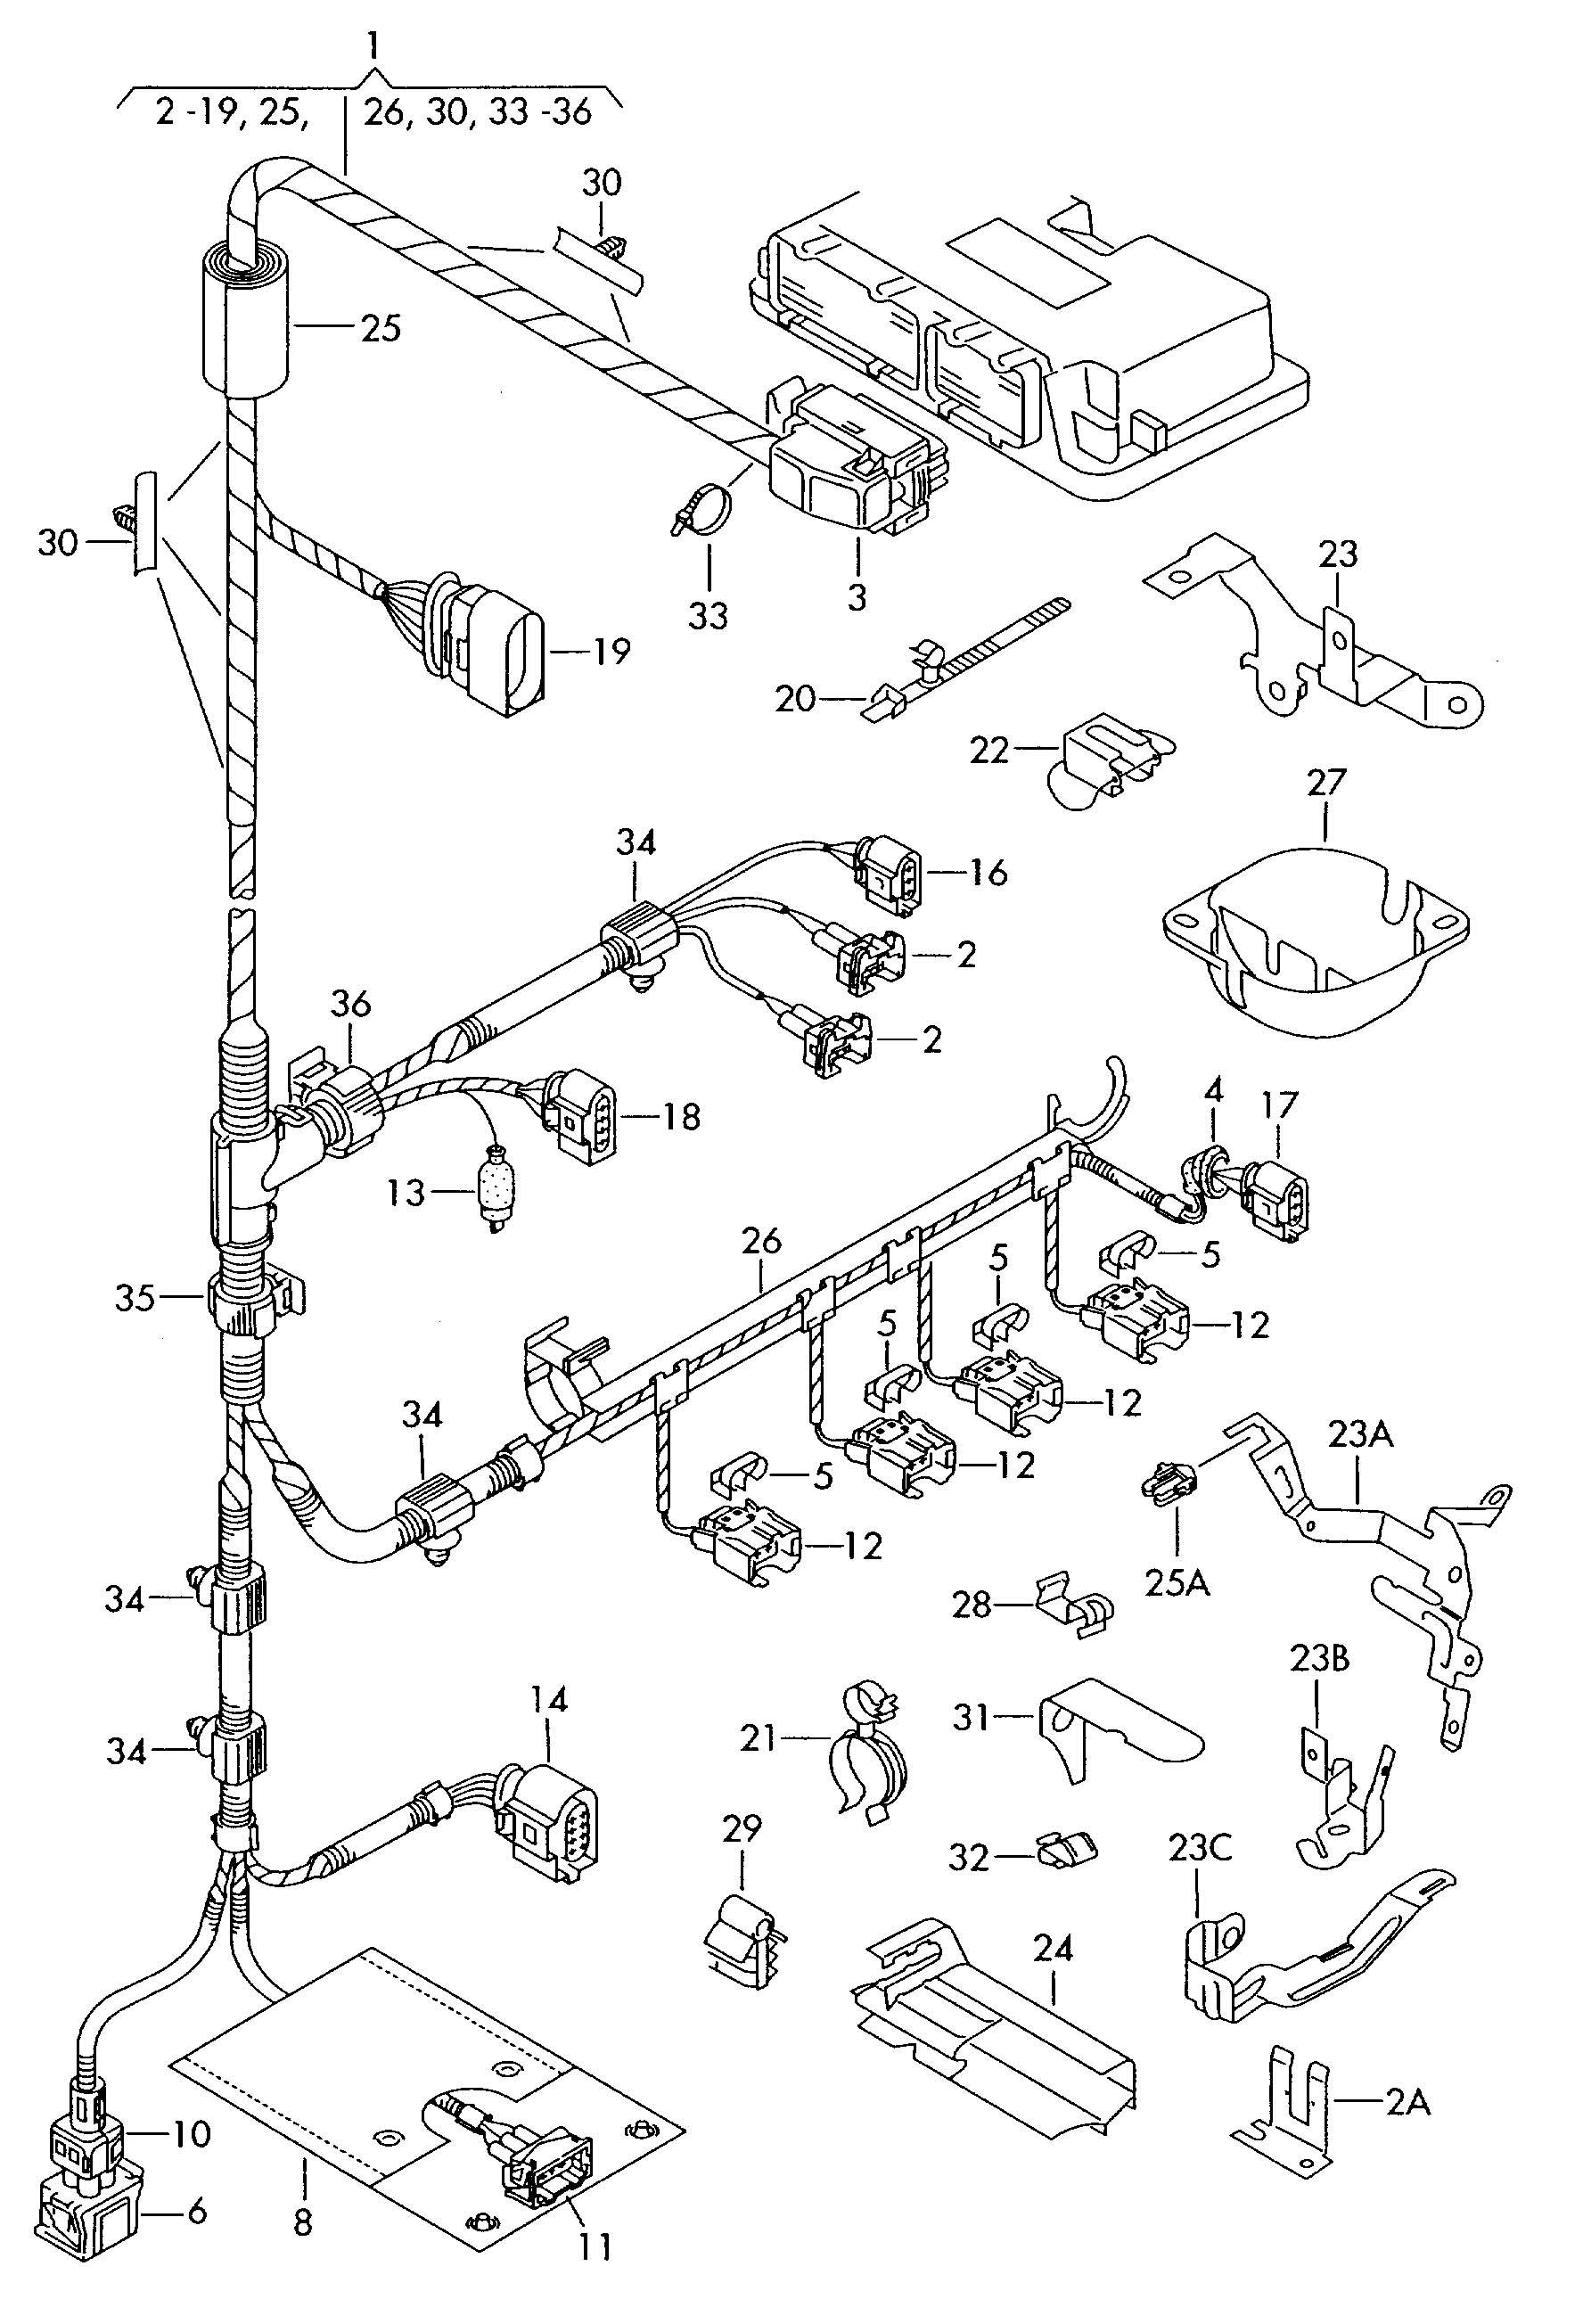 2008 vw rabbit wiring harness